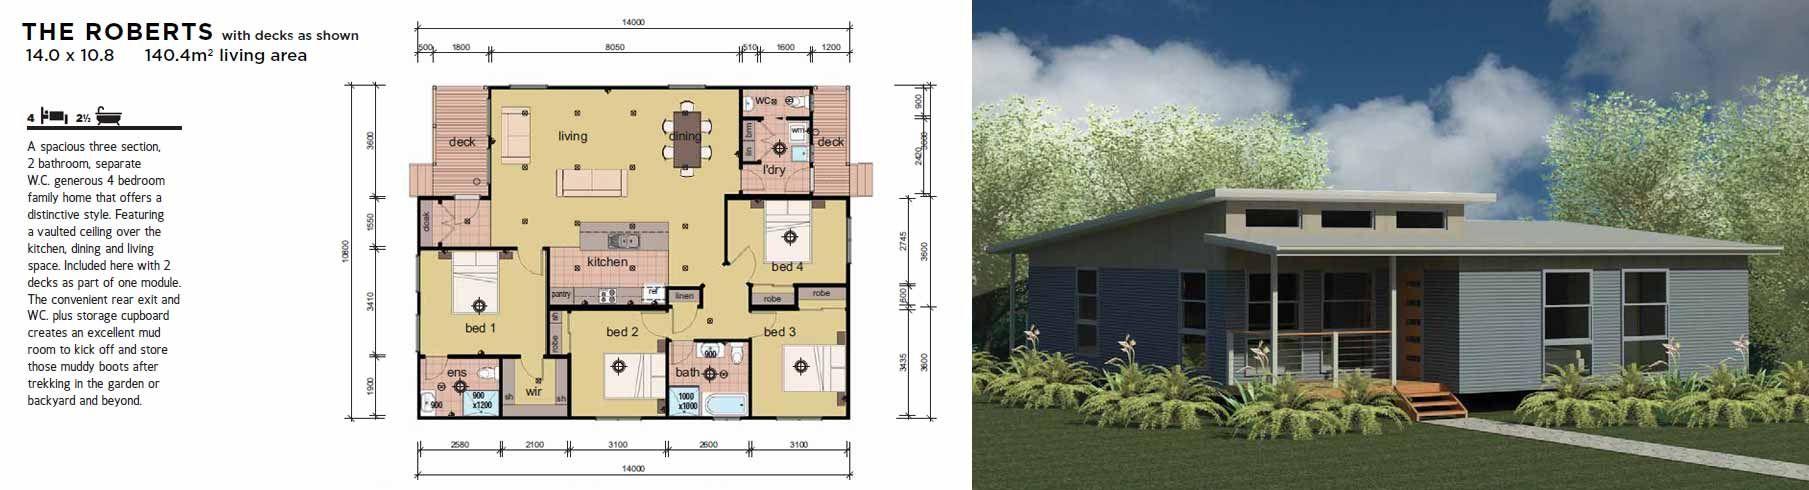 Home Design Plans Bedrooms Batroom on lodge plans designs, carport plans designs, covered porch plans designs, garage plans designs, bathroom plans designs, apartment plans designs, log cabin plans designs,